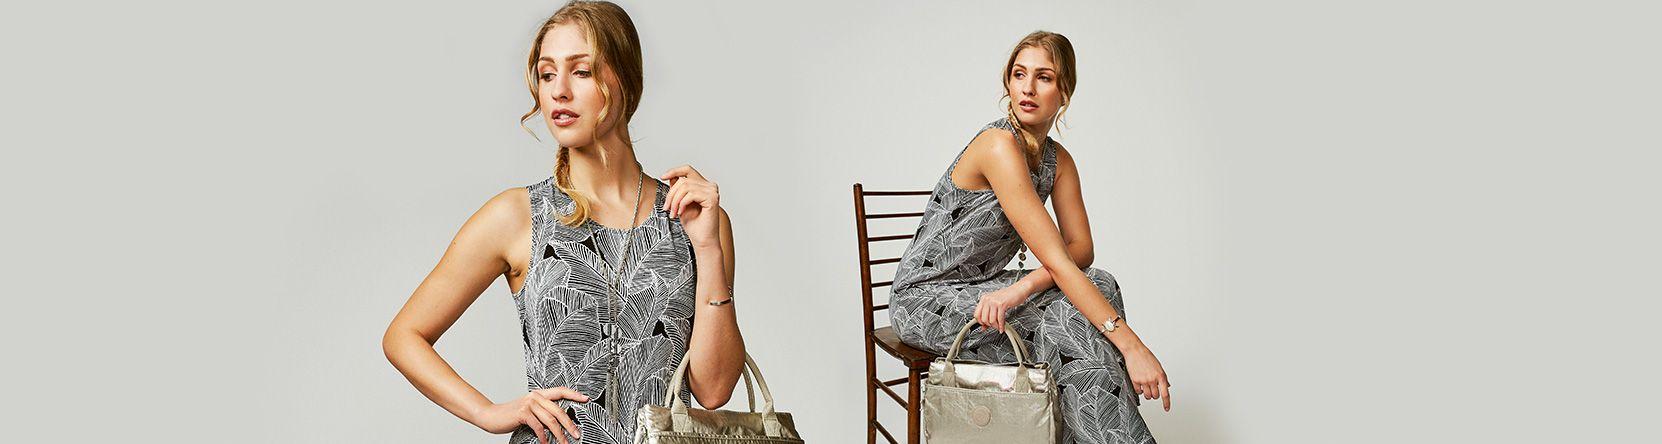 The Style List: Dress to impress